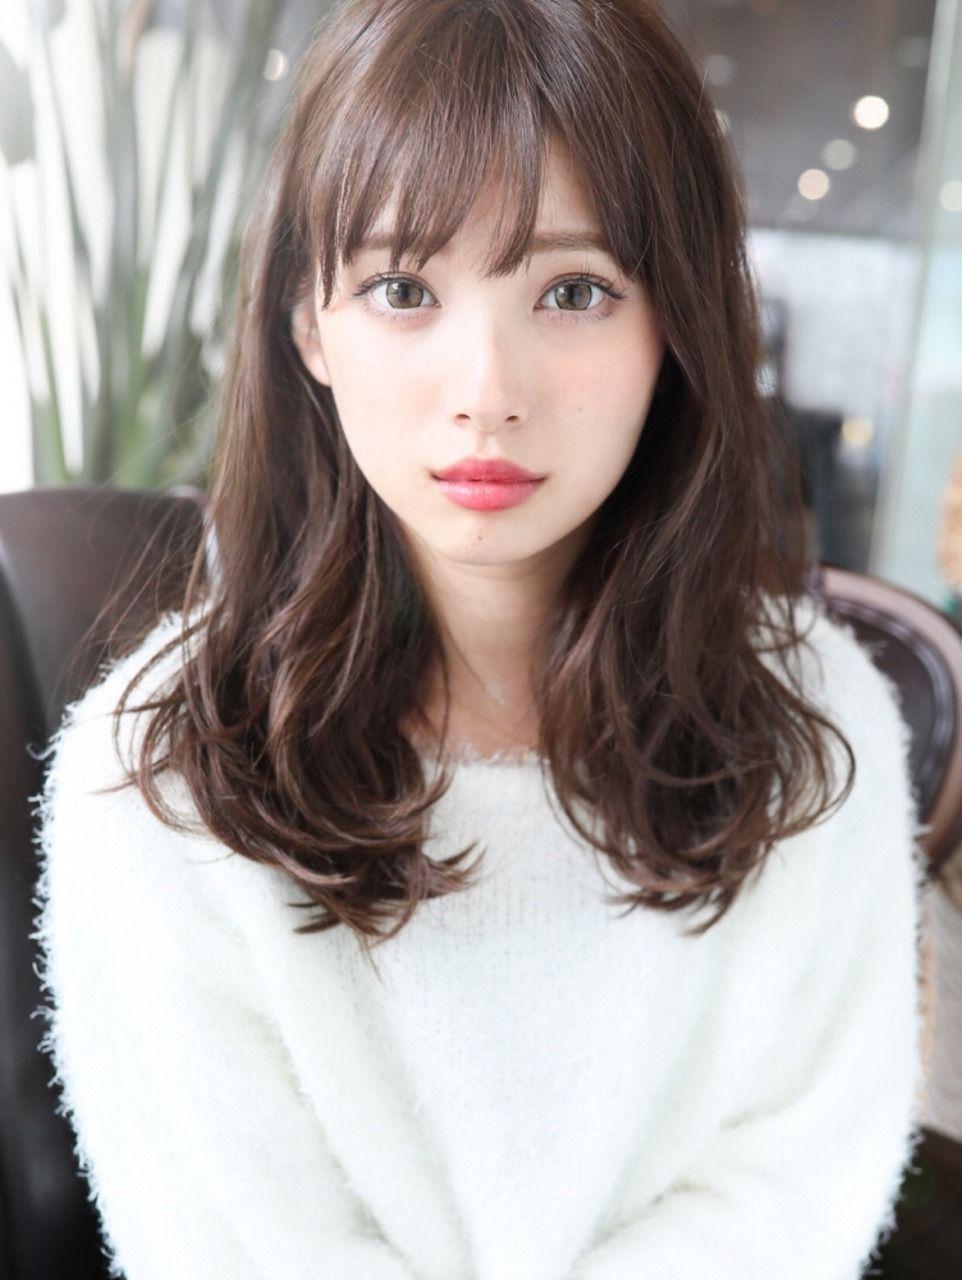 Beautiful Face 15 | 헤어스타일, 미디엄 헤어스타일, 긴 헤어스타일